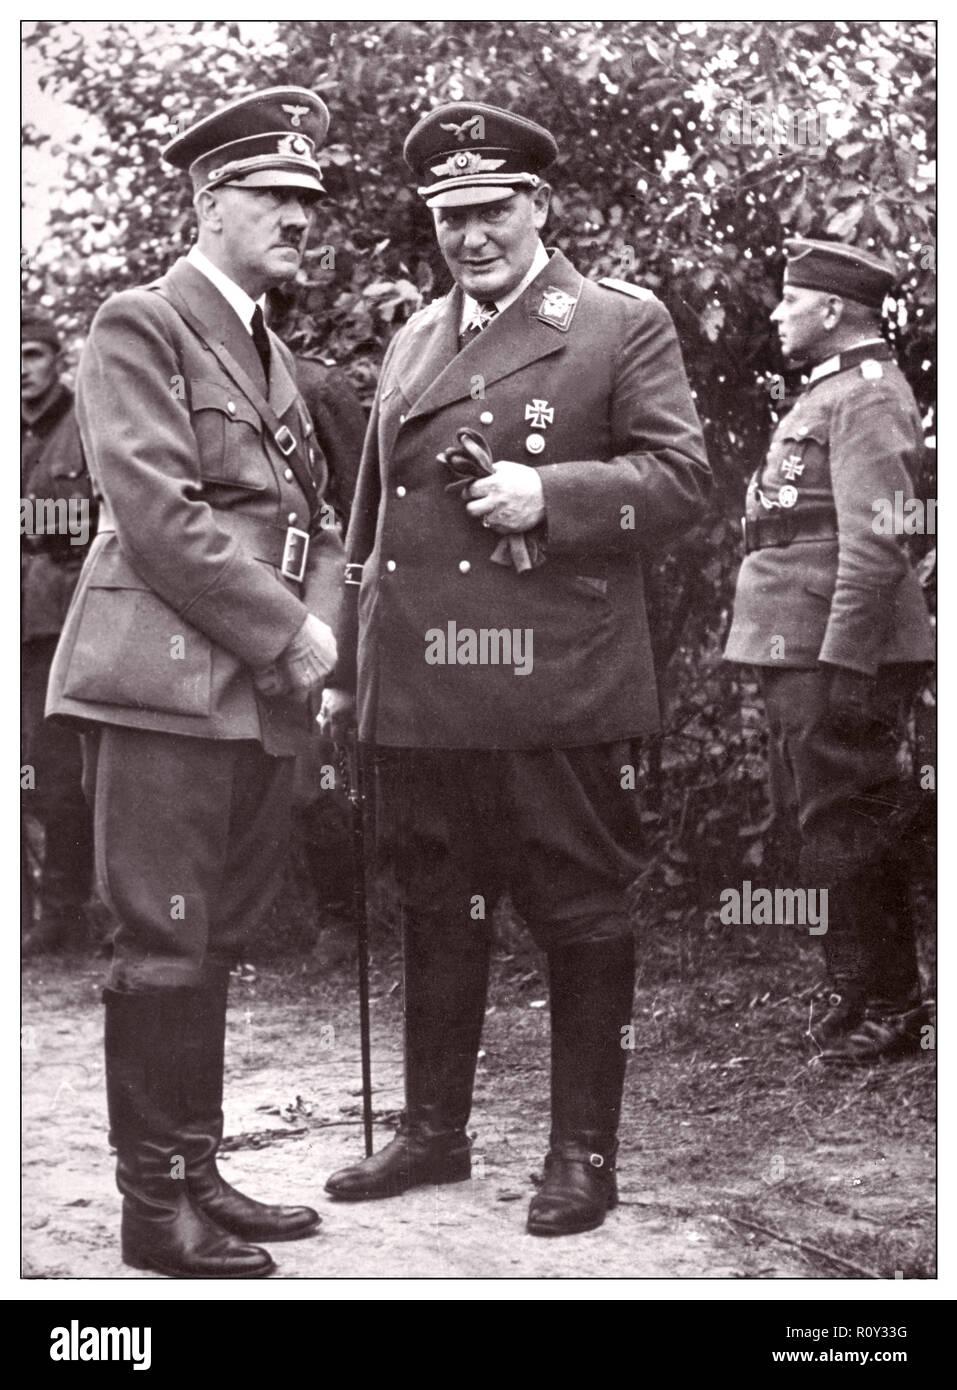 WW2 Nazi leaders Adolf Hitler and Hermann Goering in uniform 1939 World War II - Stock Image